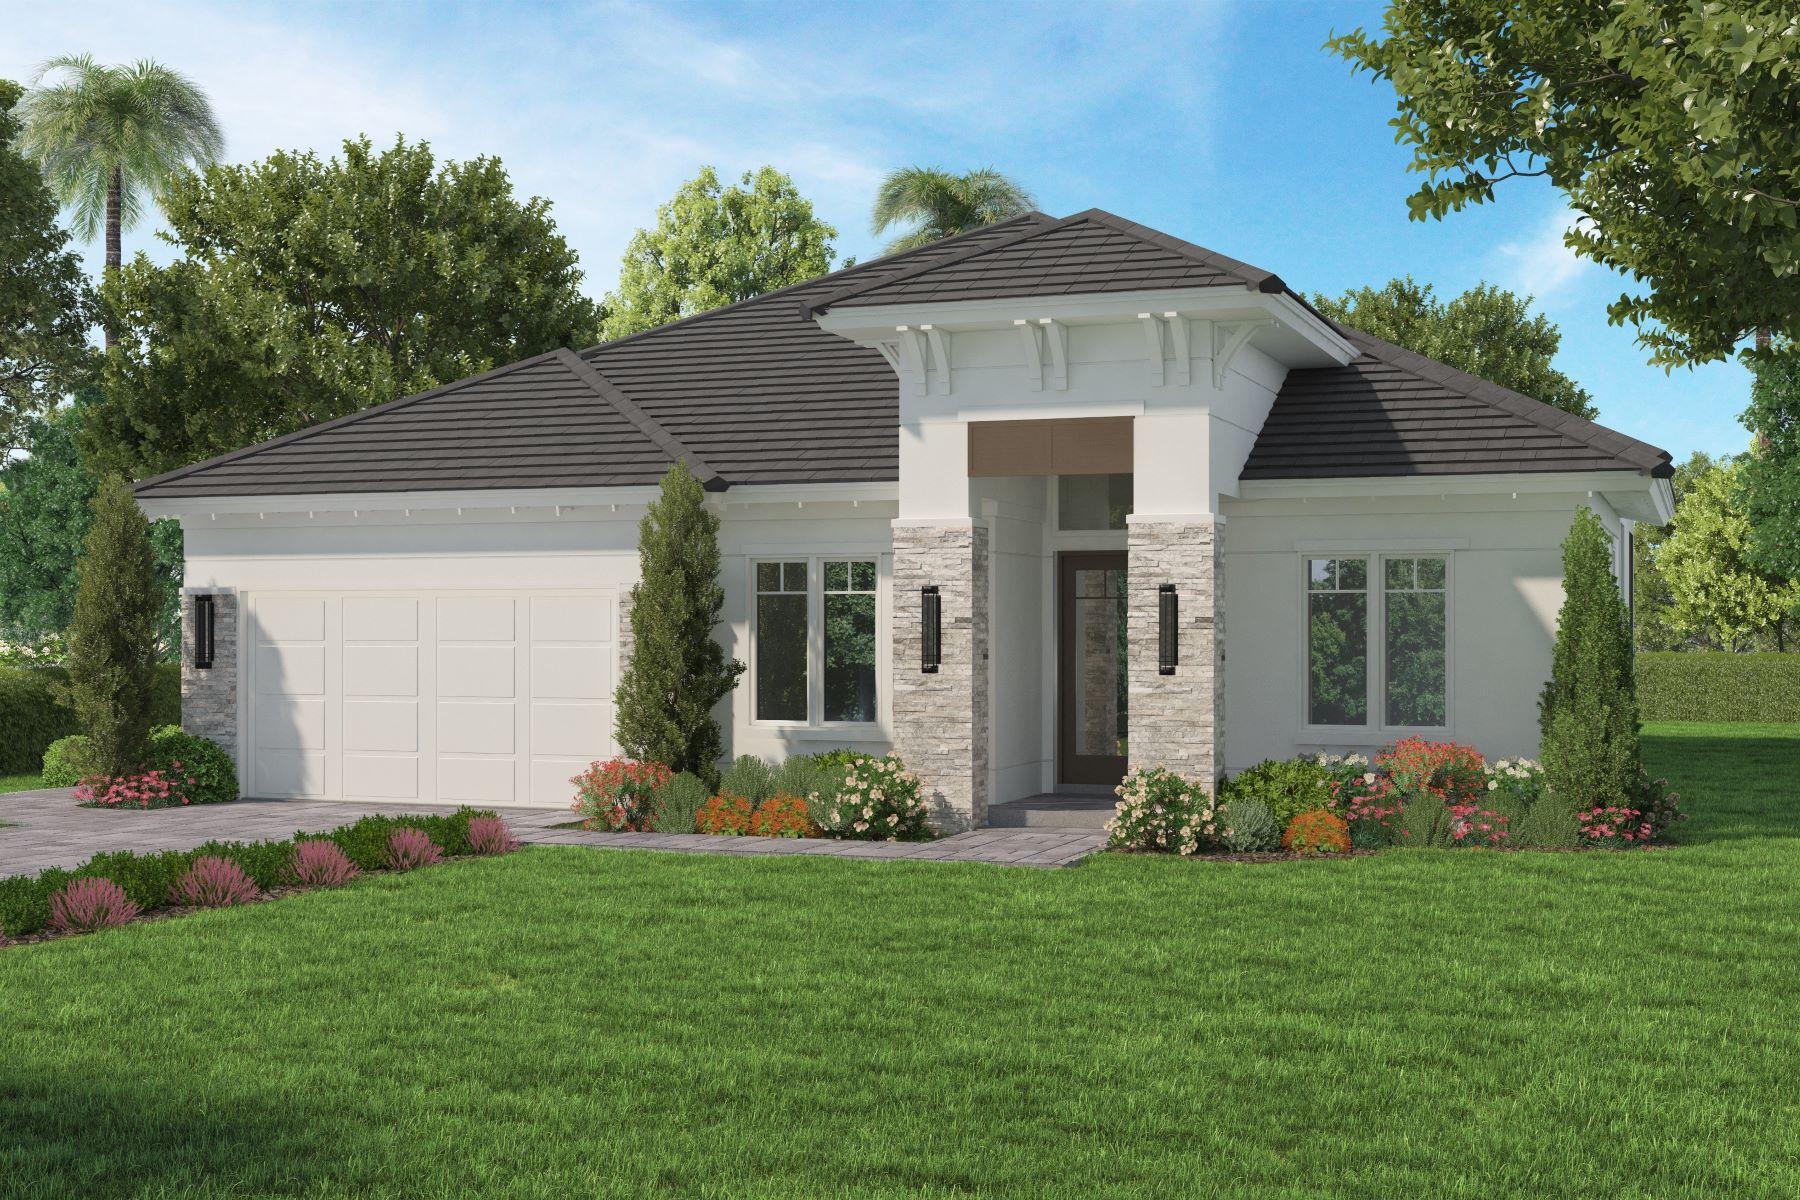 Single Family Homes για την Πώληση στο 9313 Orchid Cove Circle, Vero Beach, FL 9313 Orchid Cove Circle Vero Beach, Φλοριντα 32963 Ηνωμένες Πολιτείες